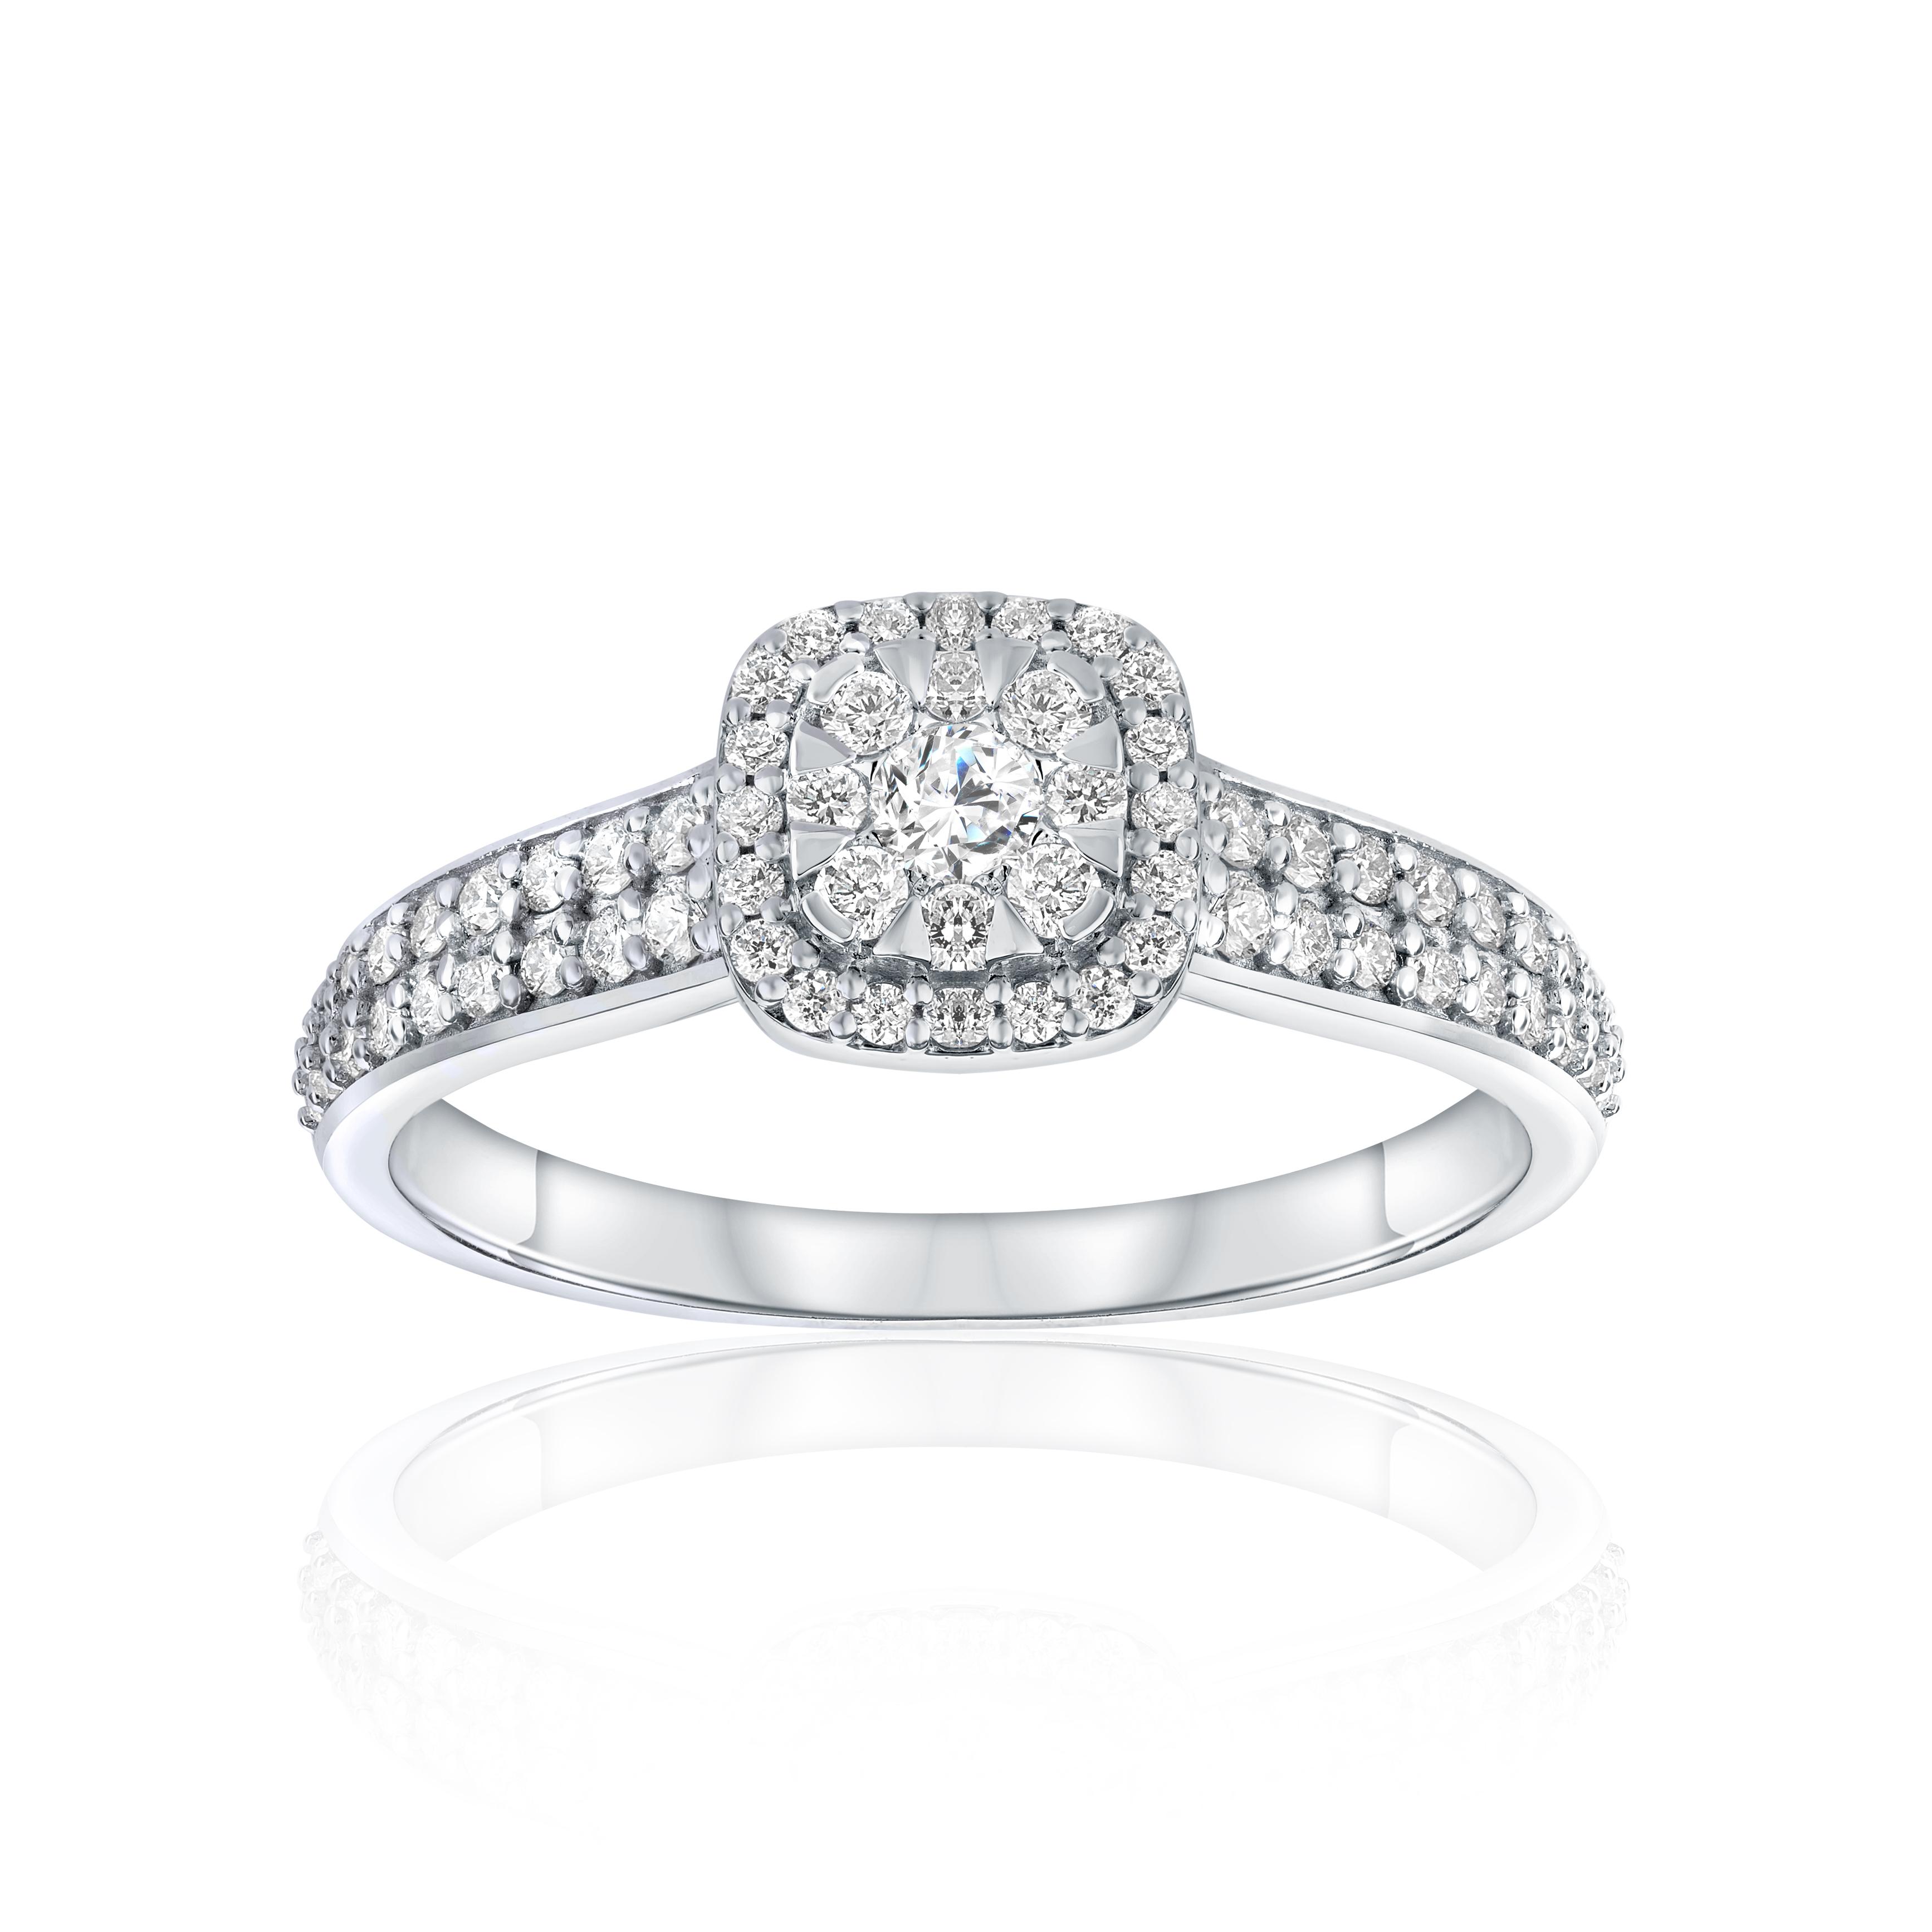 Ring for woman - 14K white gold & Diamonds T.W. 0.54 Carat